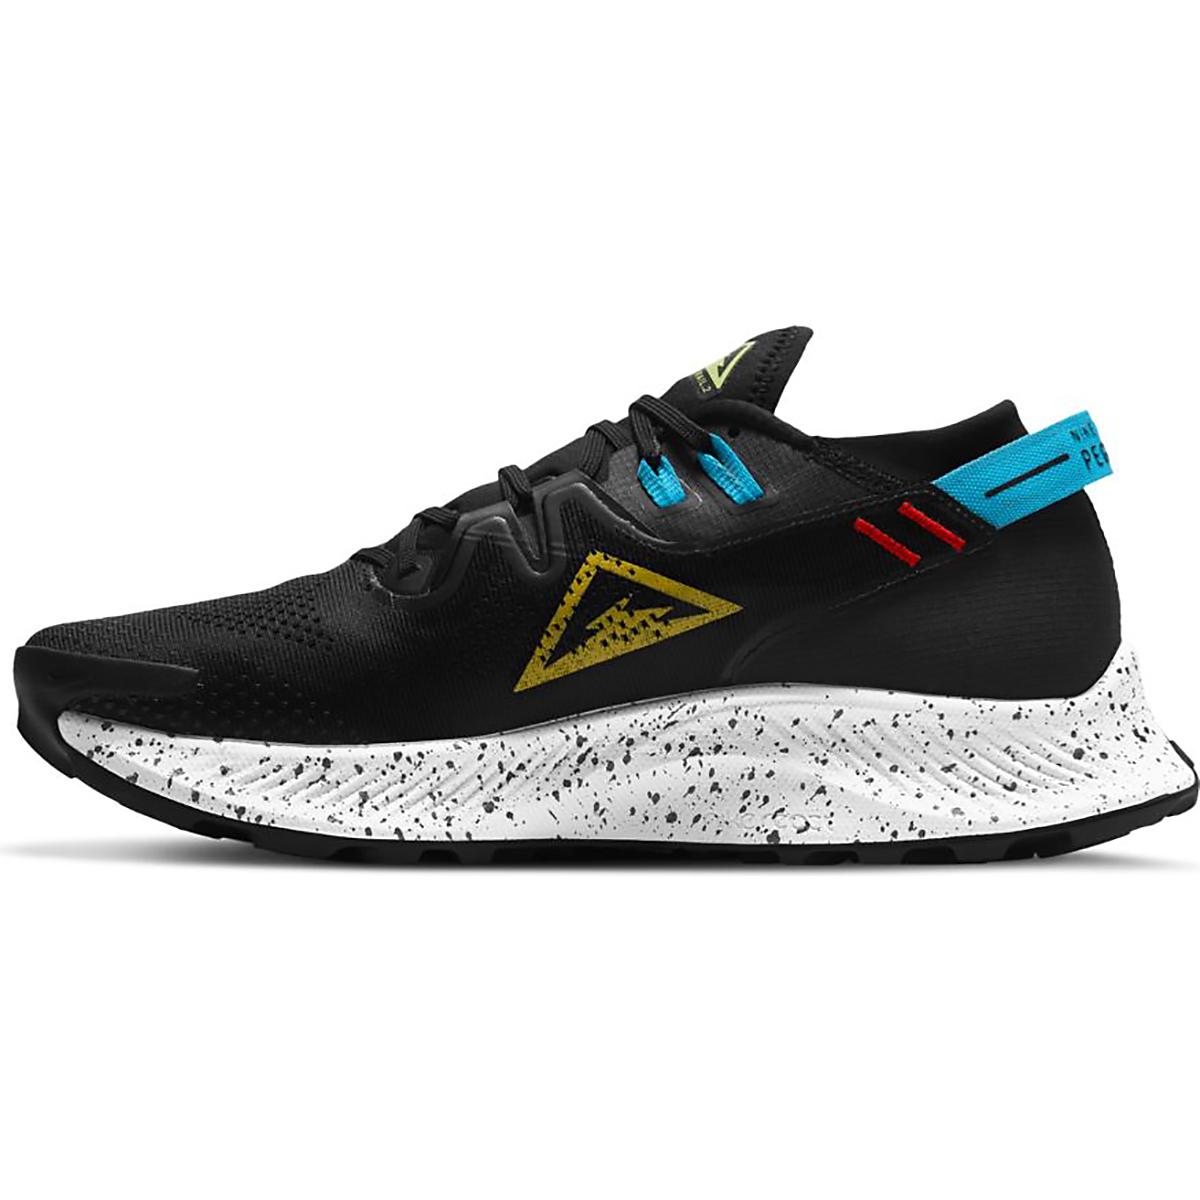 Men's Nike Pegasus Trail 2 Trail Running Shoe - Color: Black/Dark Sulfur-Off Noir-Chile Red - Size: 6 - Width: Regular, Black/Dark Sulfur-Off Noir-Chile Red, large, image 2